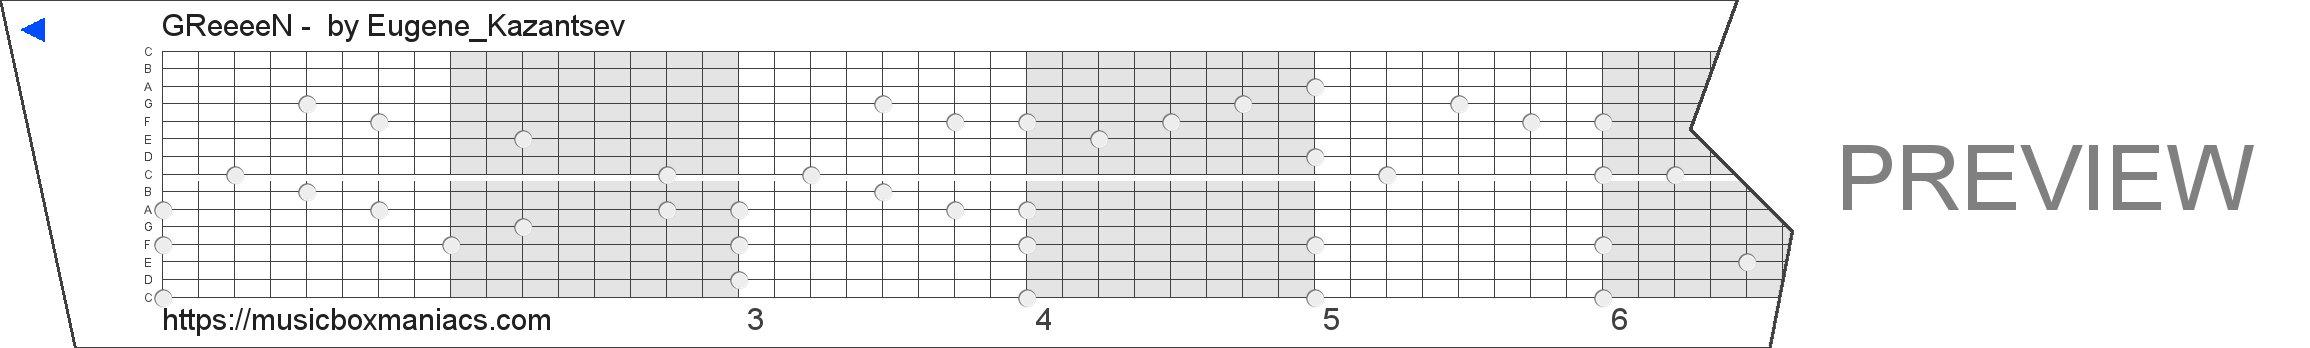 GReeeeN - キセキ 15 note music box paper strip